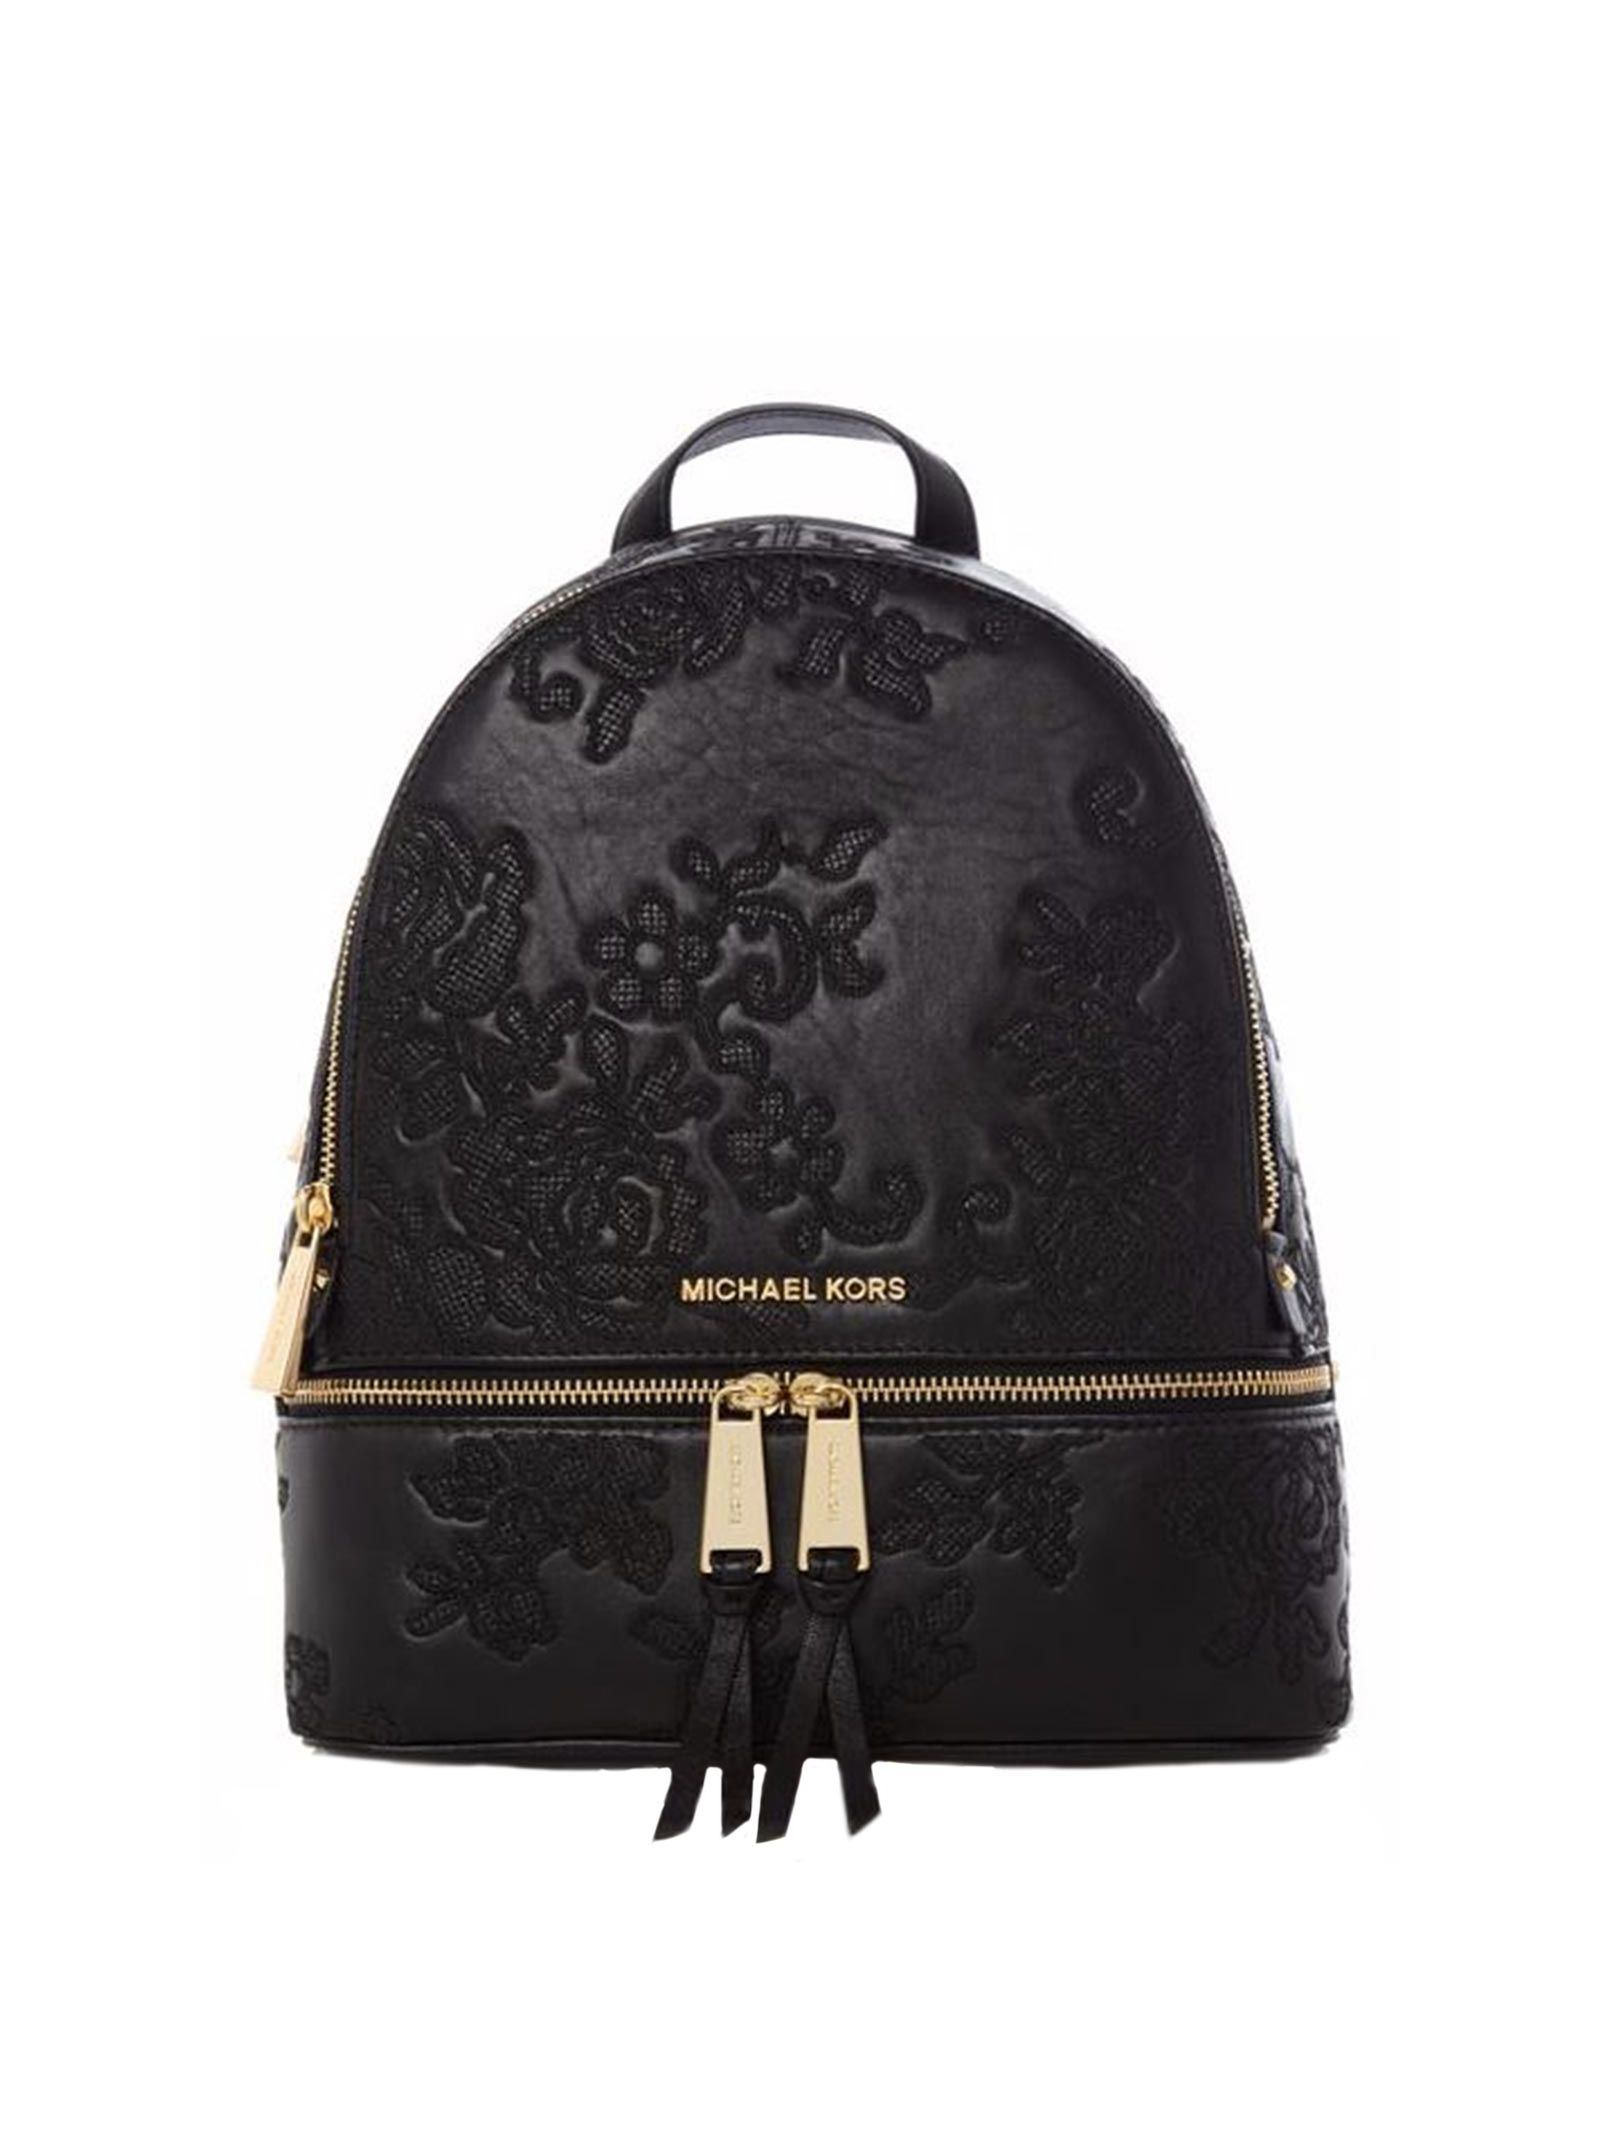 michael kors female michael kors black lace backpack